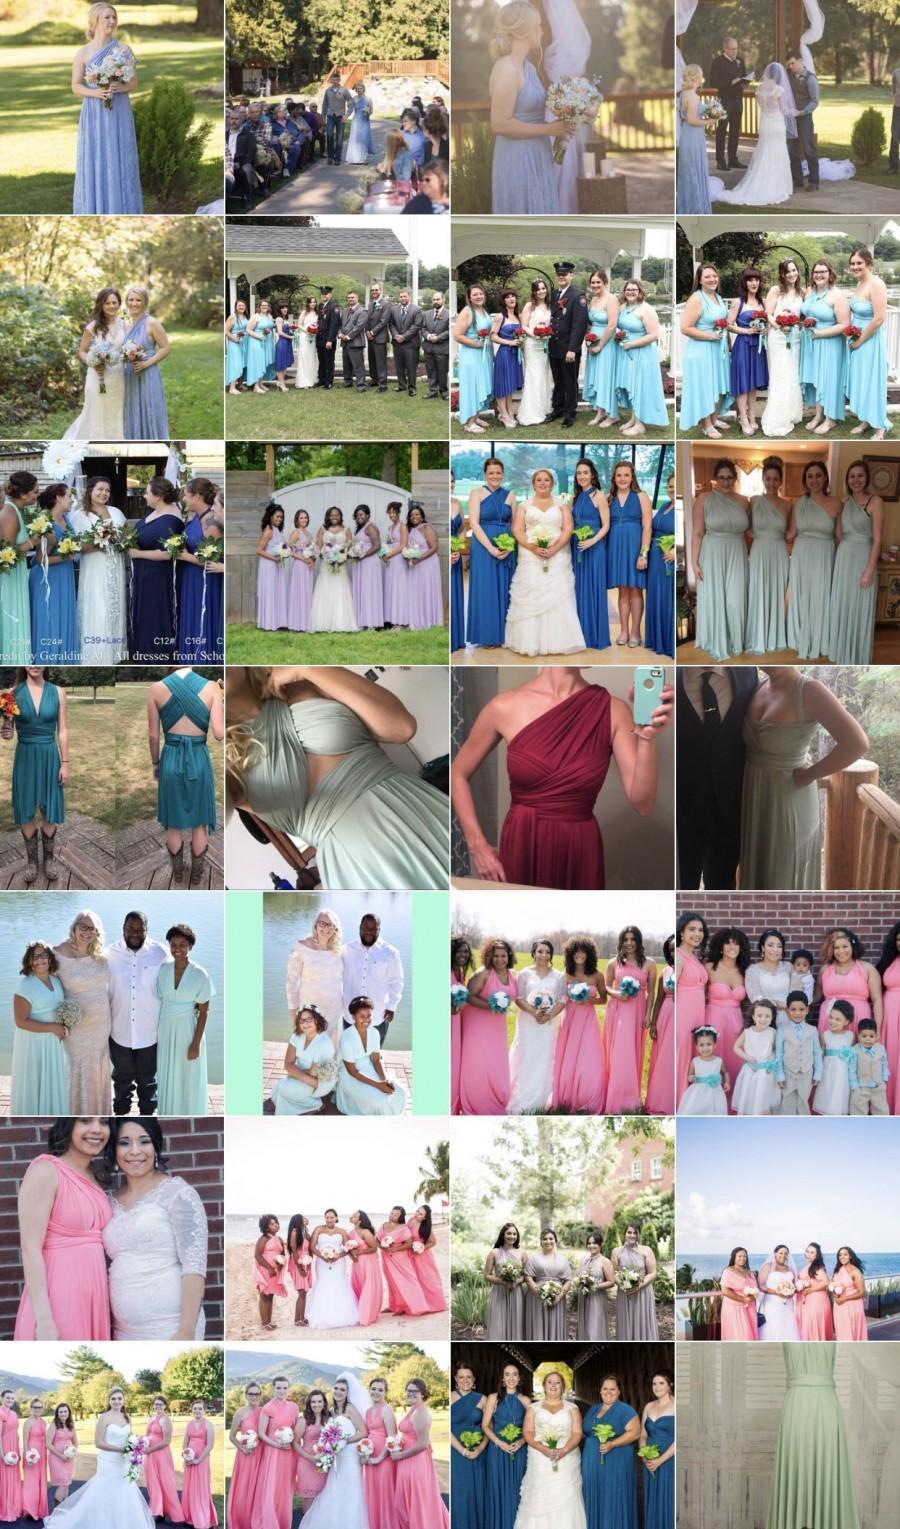 Wedding - Sample dress   Bridesmaid Dresses, Infinity dress maternity dress, party dress